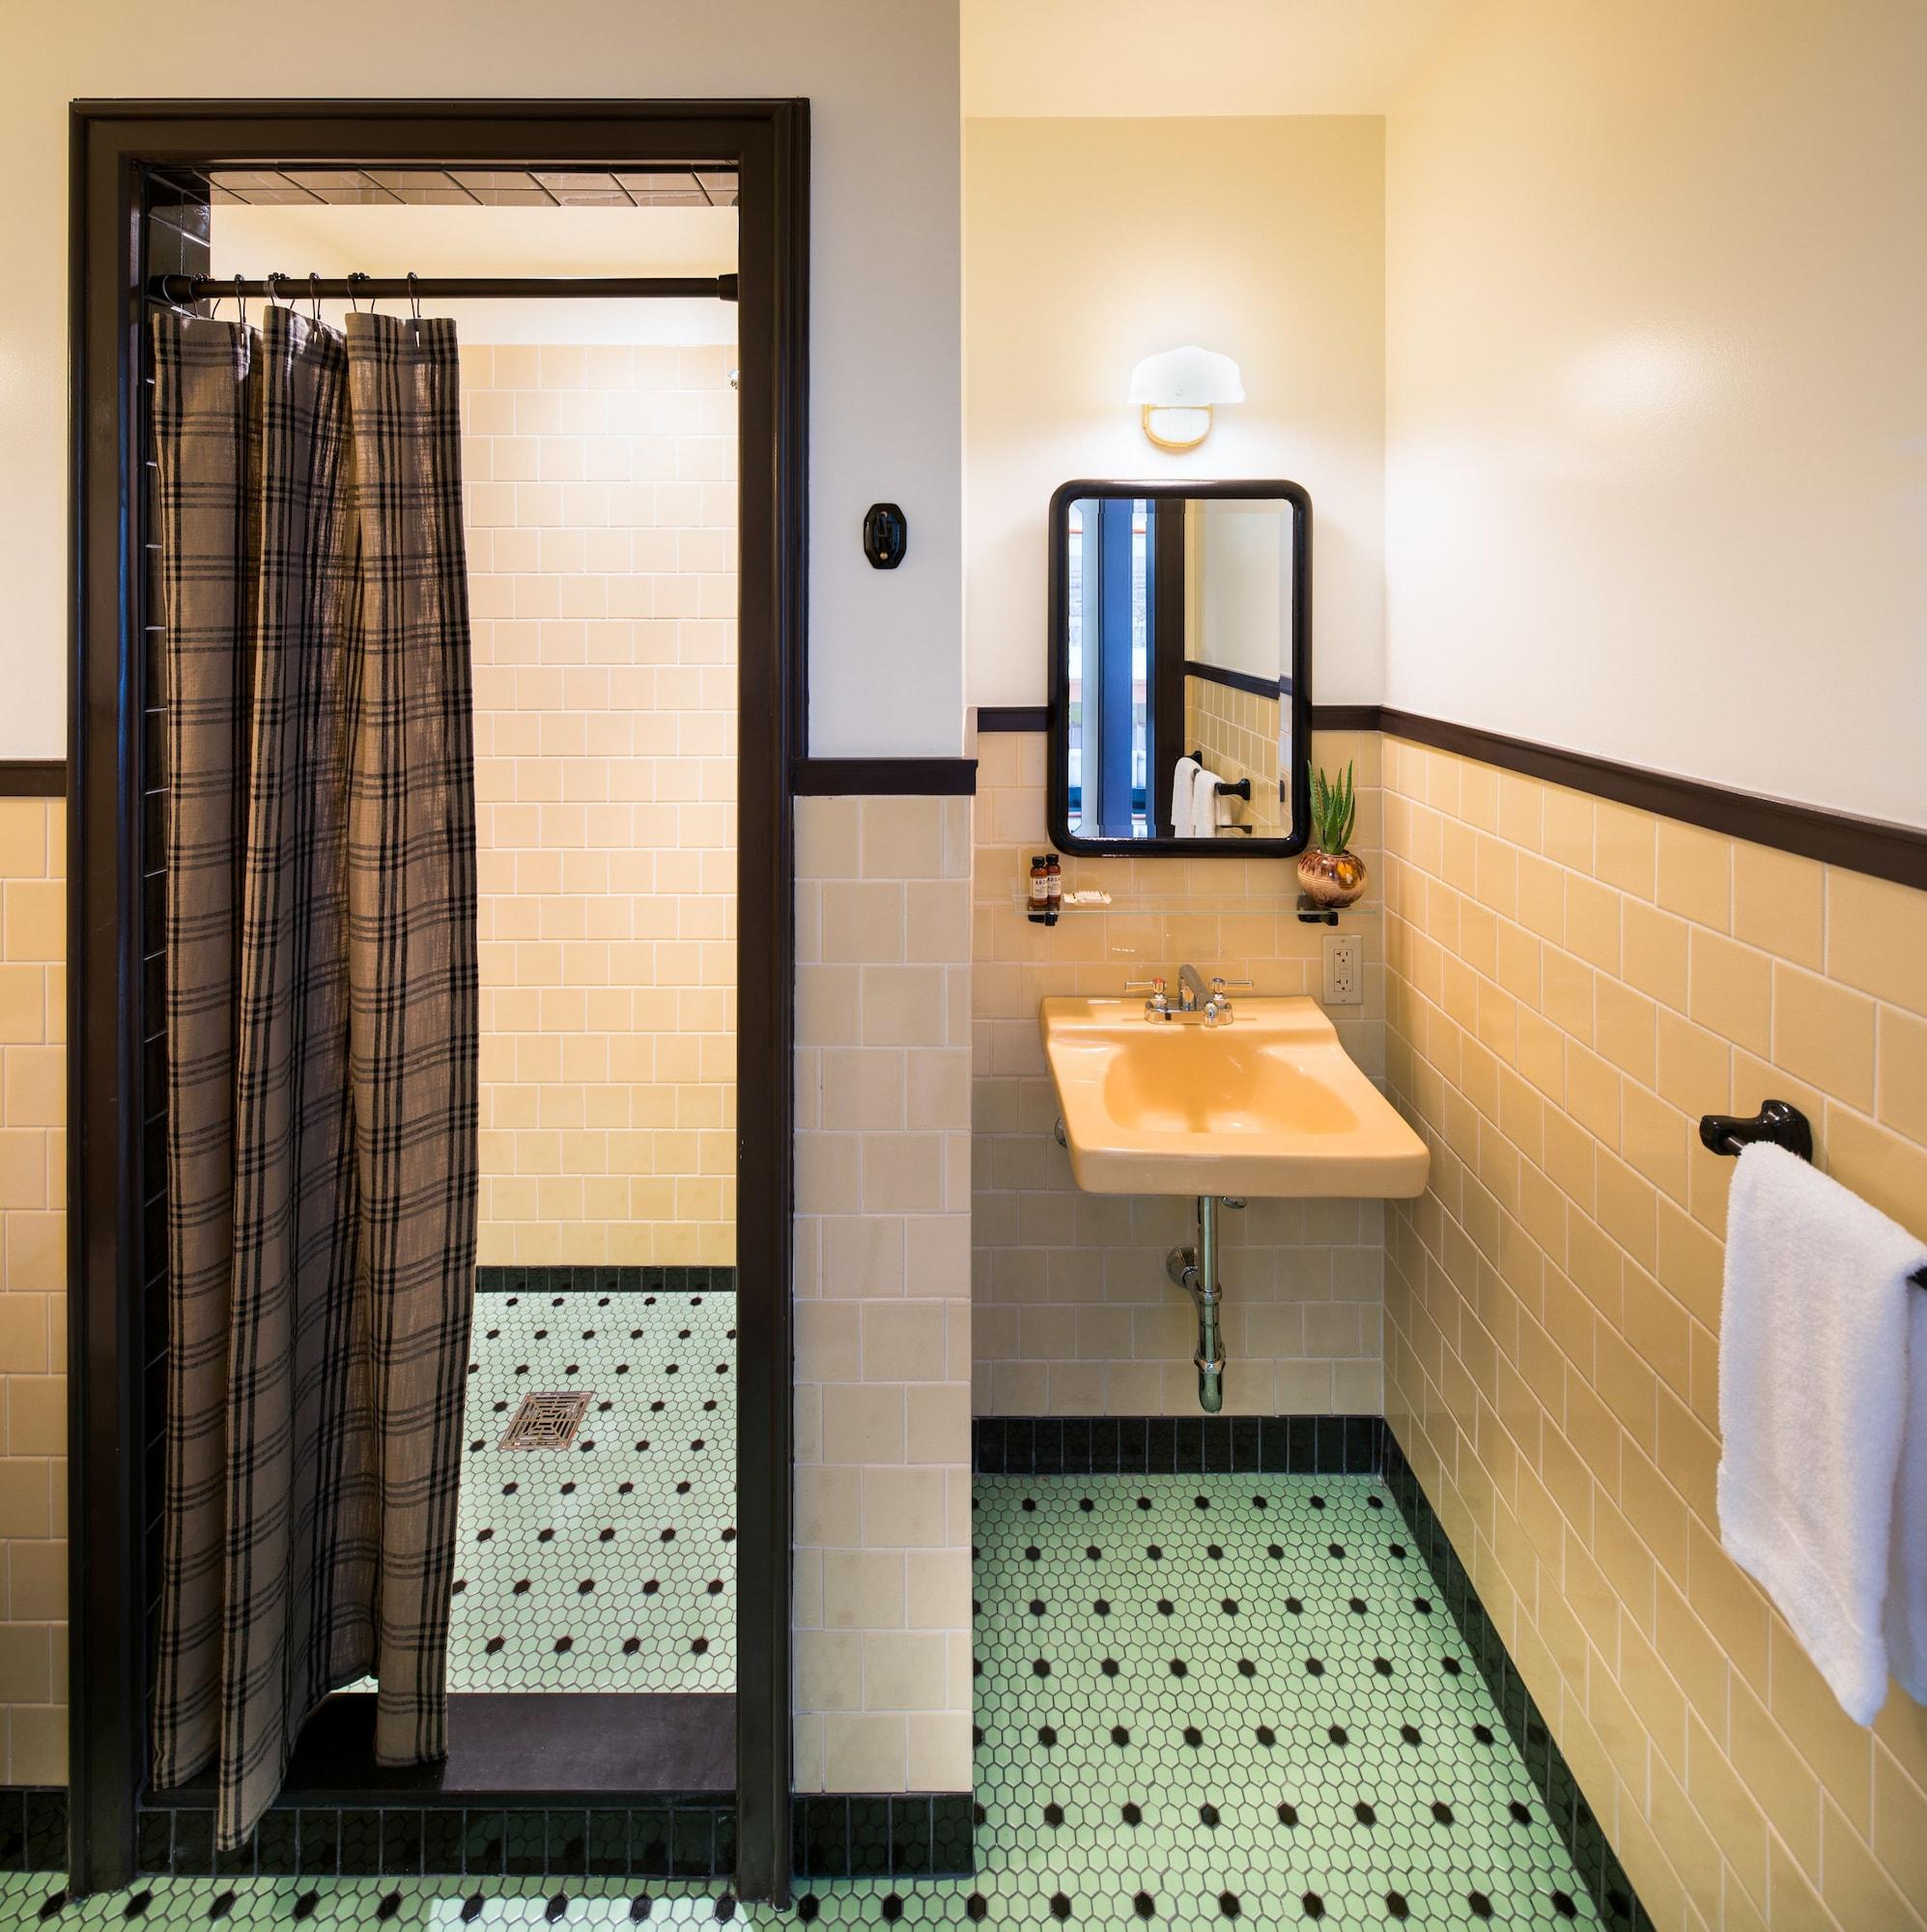 Standard Room (King - City)